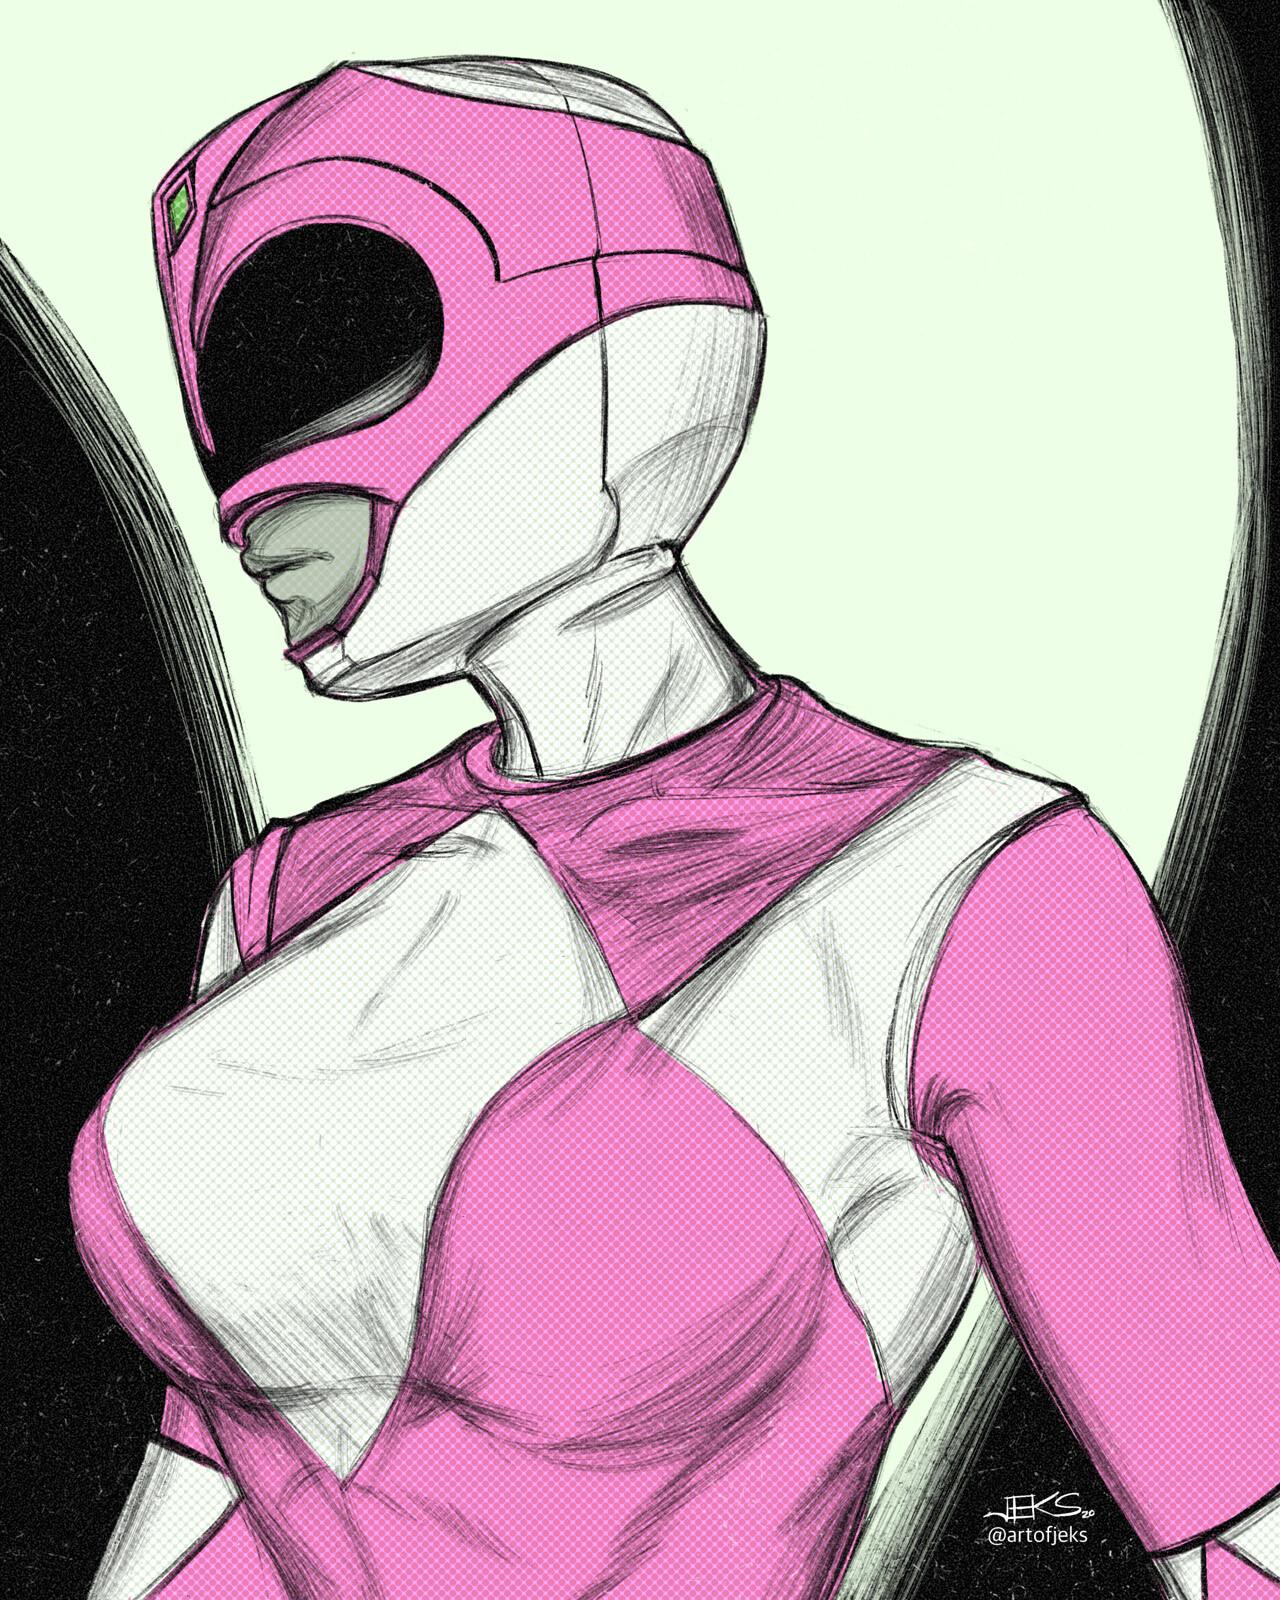 30 - Pink Ranger of Power Rangers